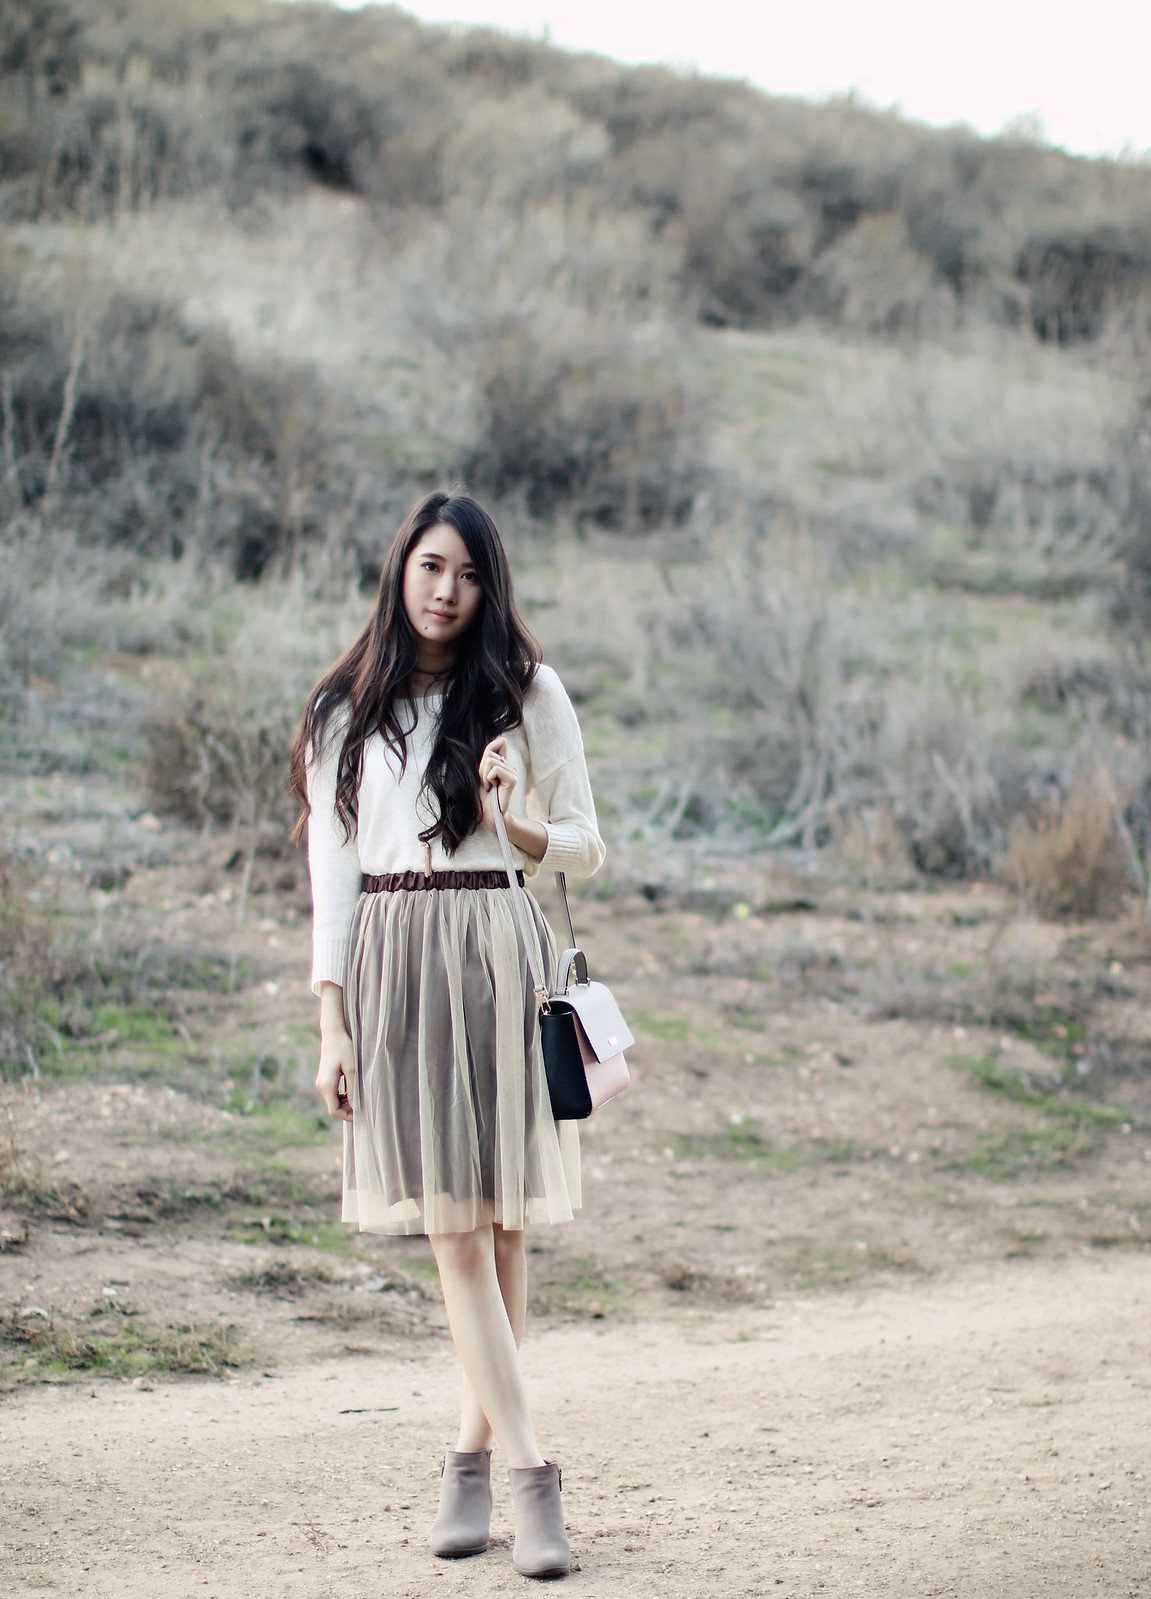 1327-ootd-fashion-chiffon-lace-skirt-openback-sweater-express-holiday2016-lookbook-korean-fashion-elizabeeetht-clothestoyouuu